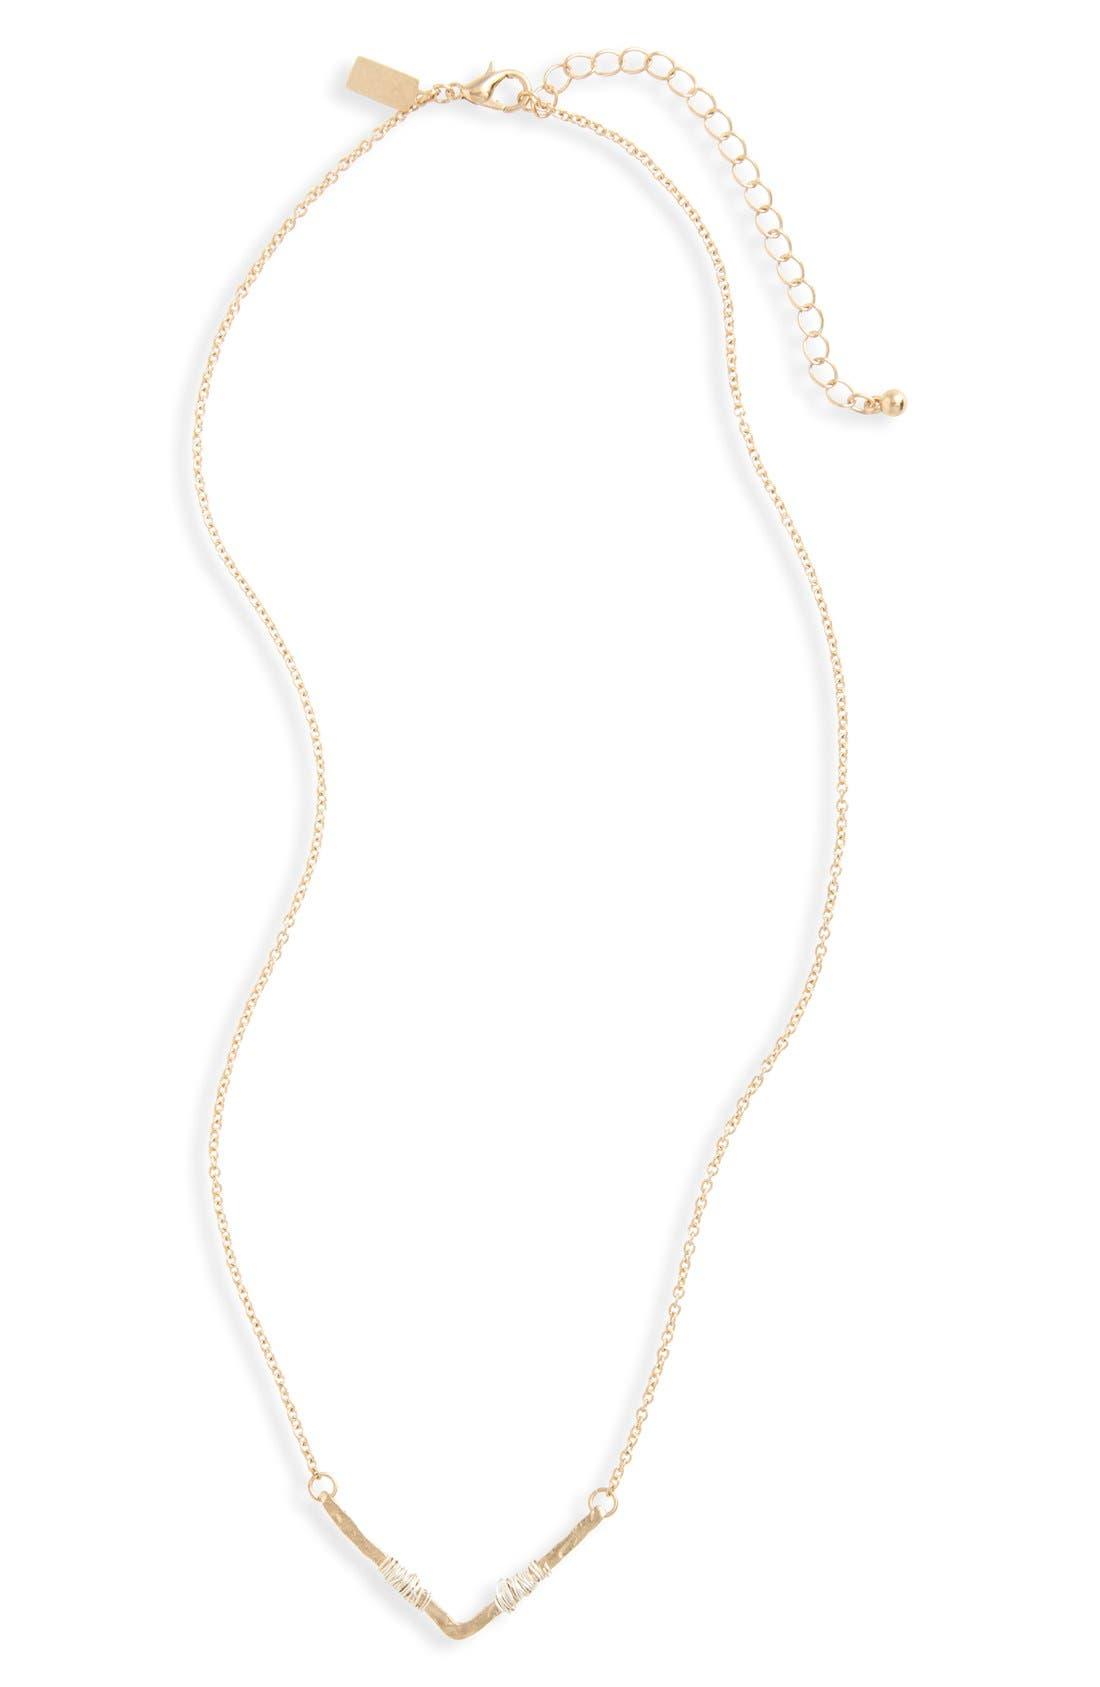 Main Image - Canvas Jewelry Wire Wrap Chevron Pendant Necklace